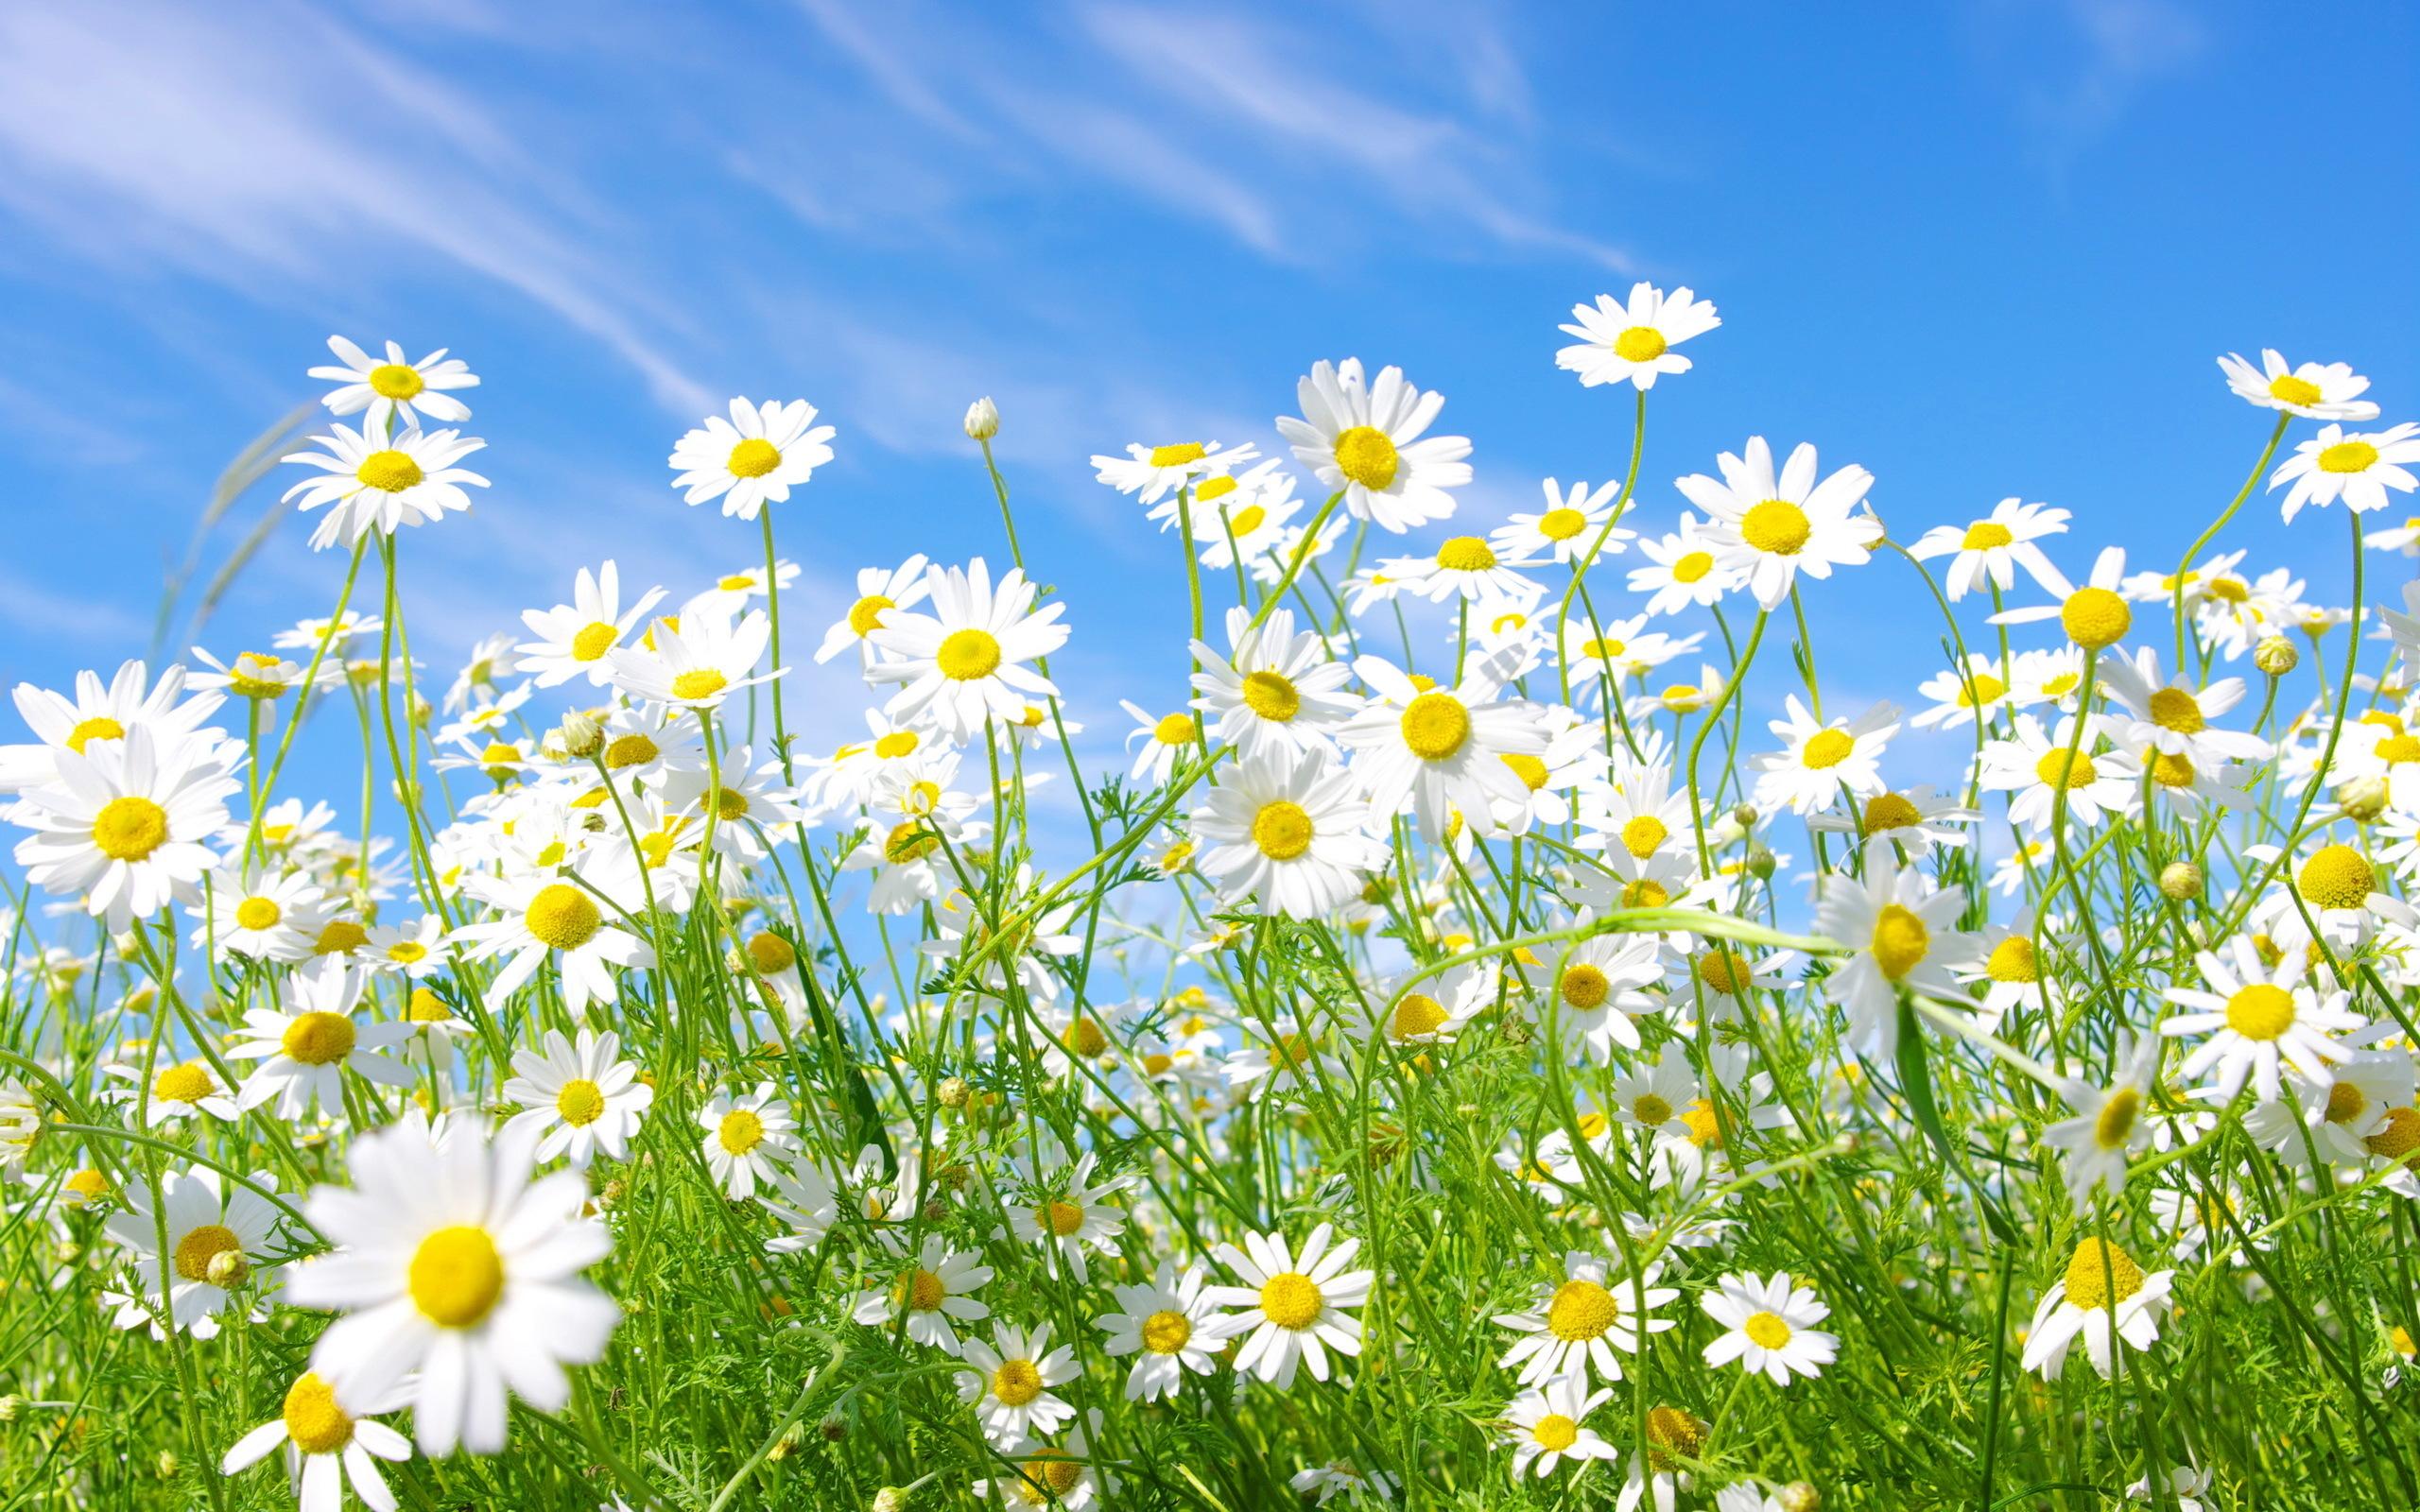 daisy meadow 2